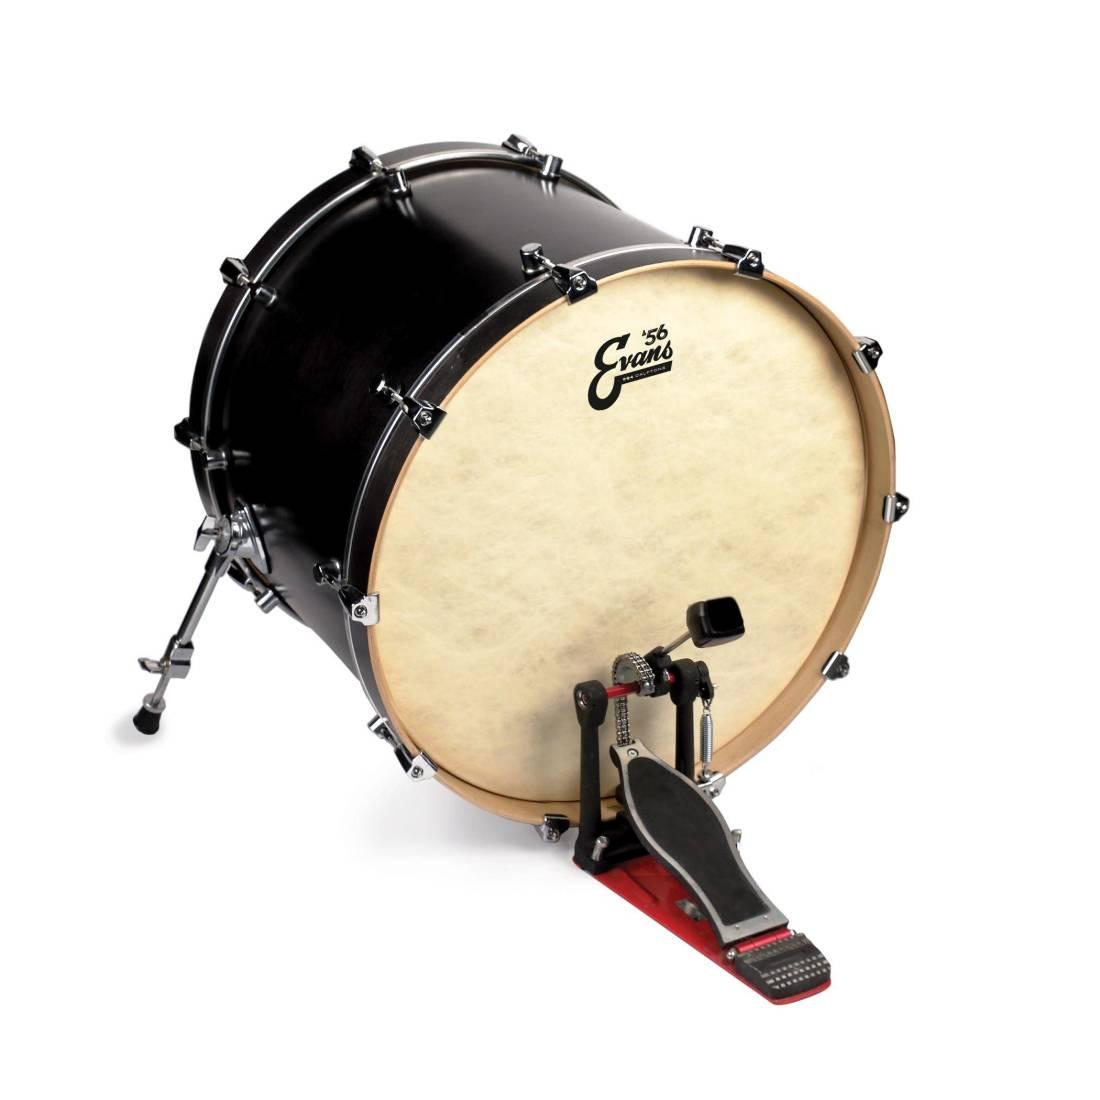 evans eq4 calftone bass drum head 24 inch long mcquade musical instruments. Black Bedroom Furniture Sets. Home Design Ideas